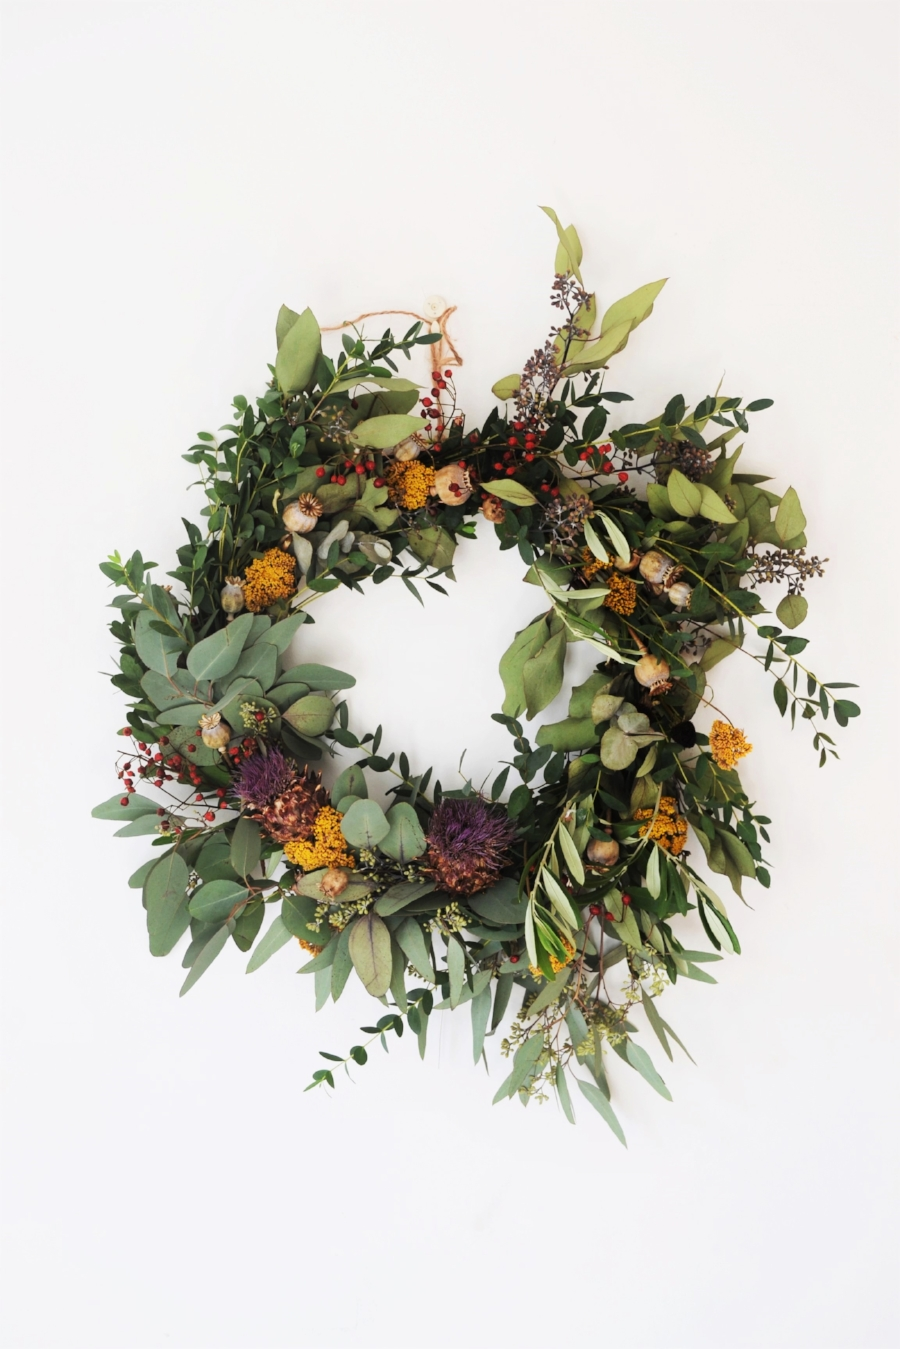 How-to-make-an-autumn-wreath-webb-and-farrer-brighton-flower-workshop (20).JPG